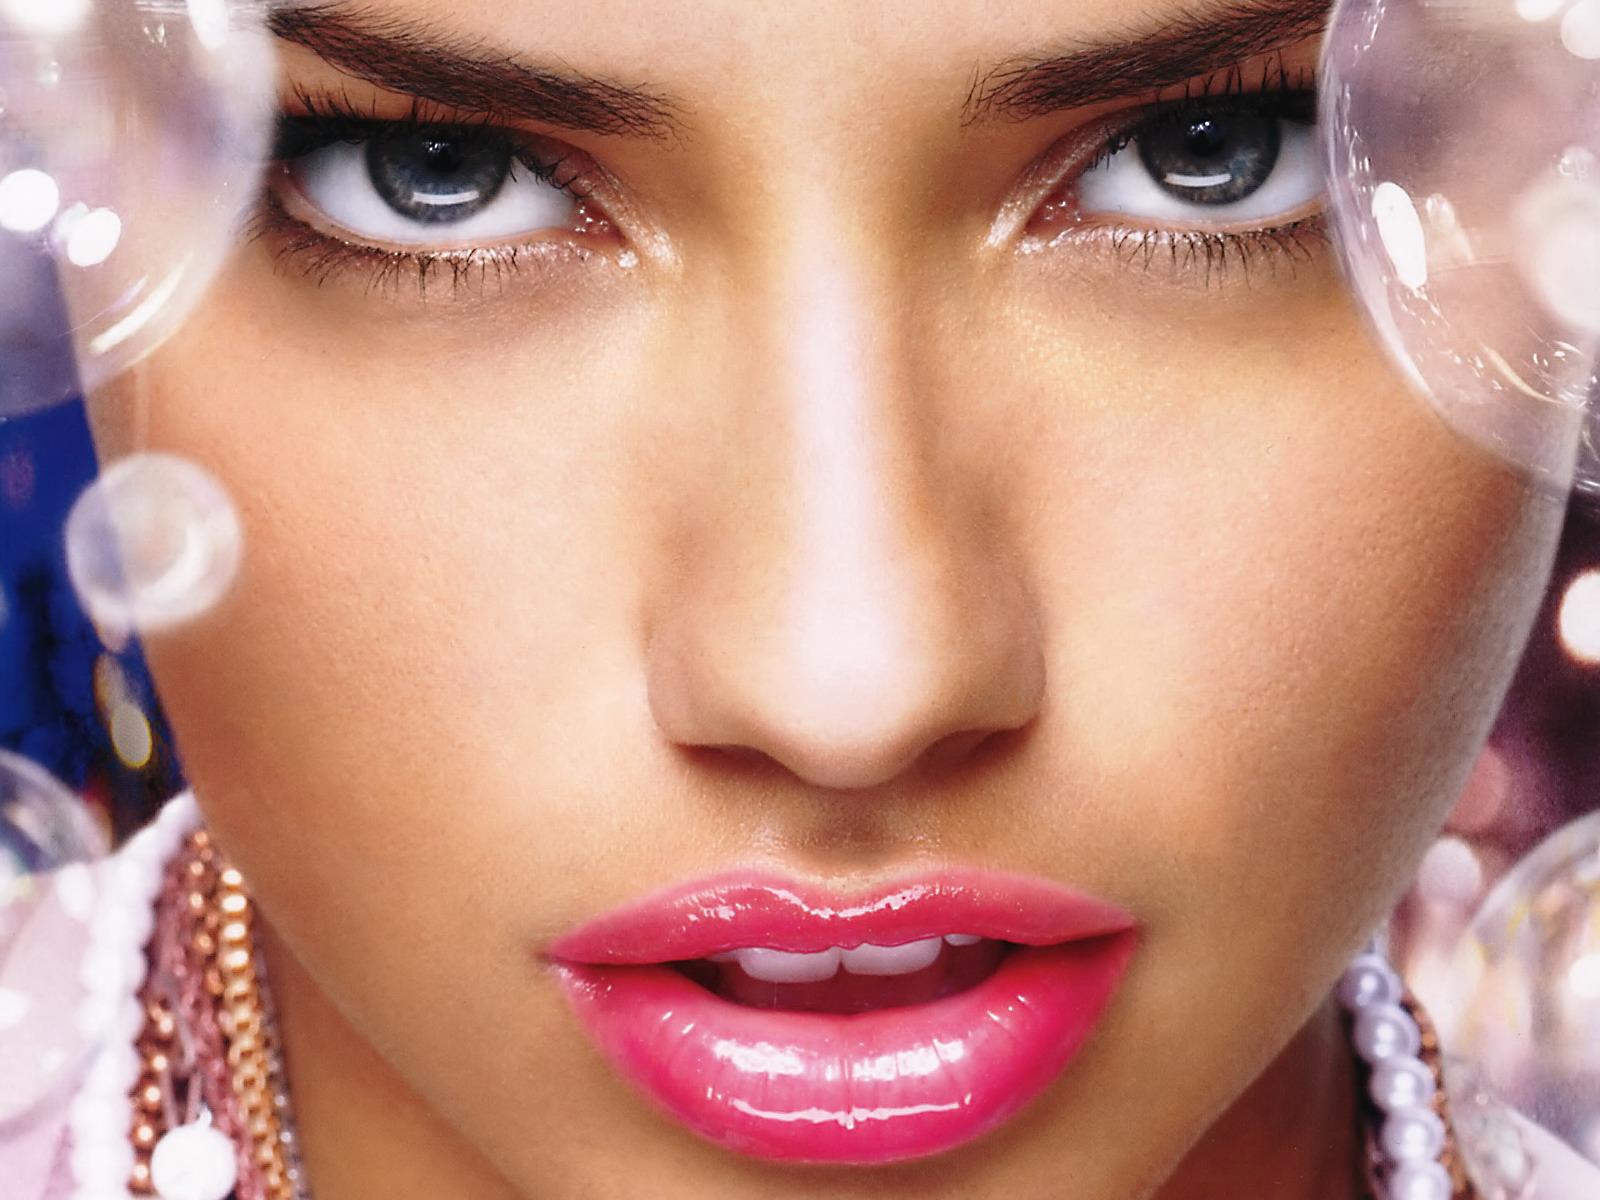 adriana_lima_pretty_lips-normal